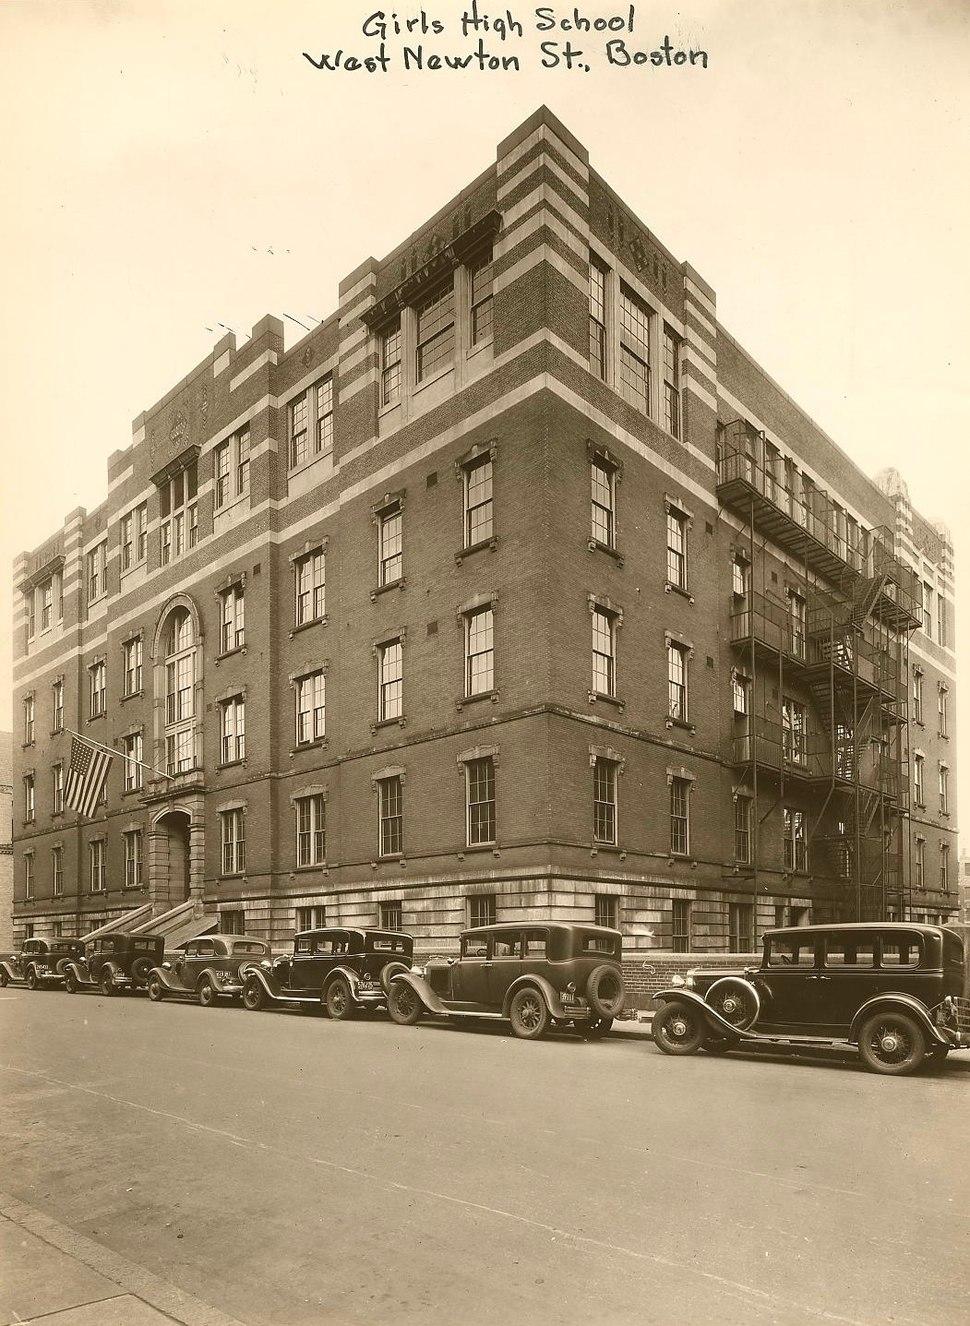 Girls' High School - 0403002067b - City of Boston Archives